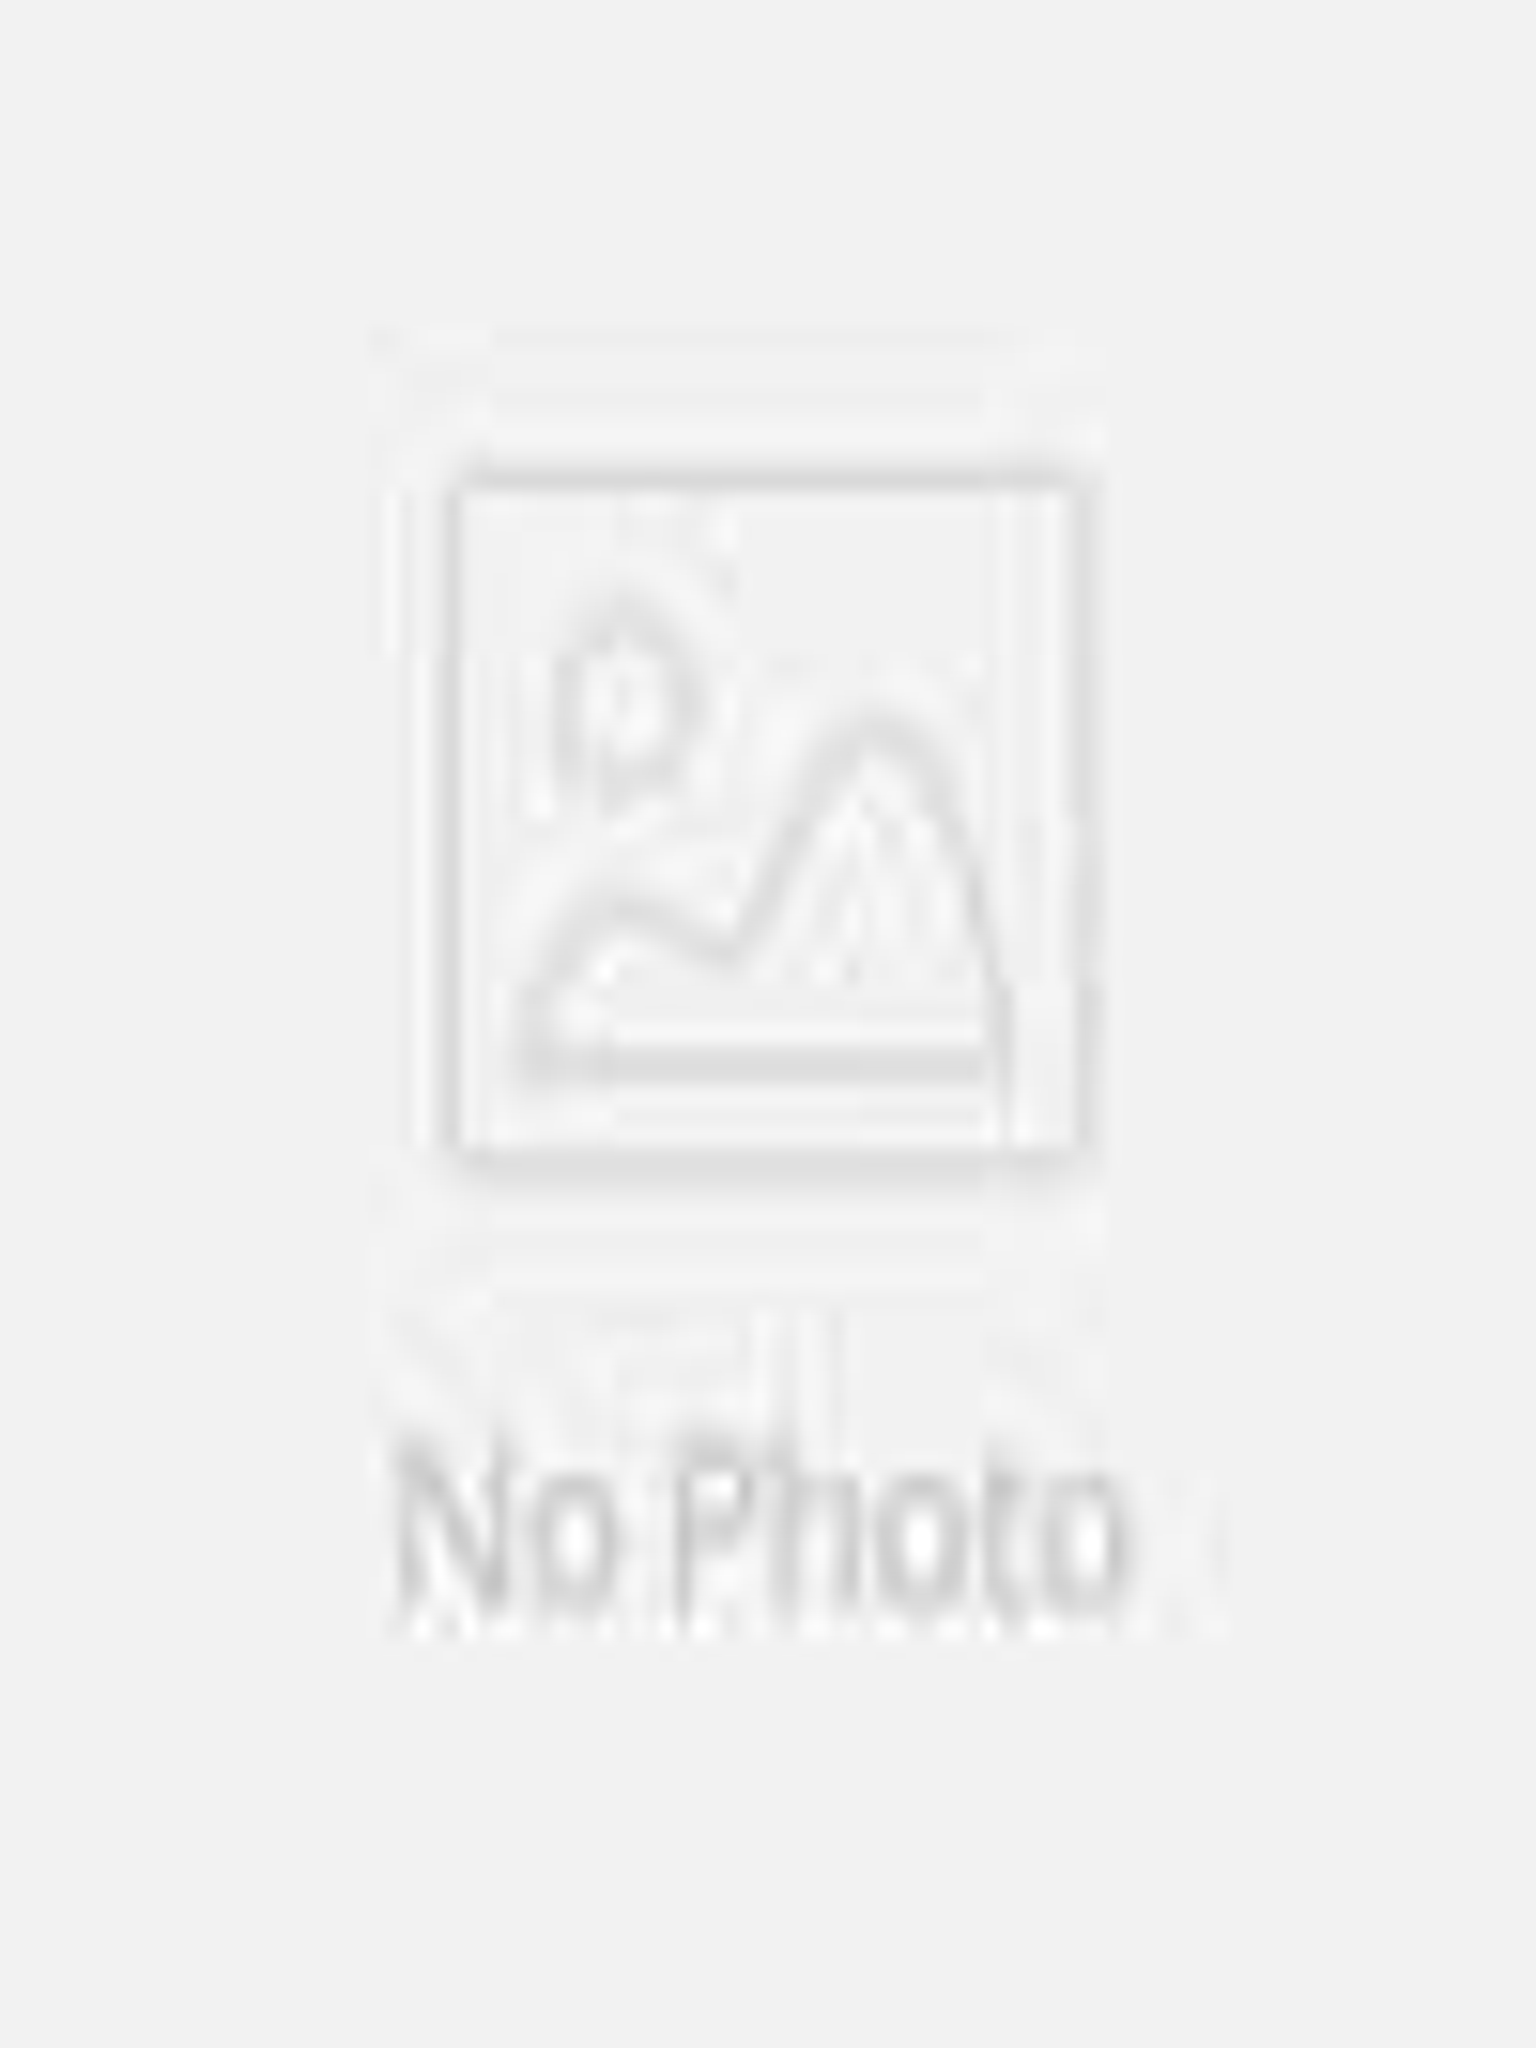 Ukulele Guitar Chords Promotion-Online Shopping for Promotional Ukulele Guitar Chords on ...